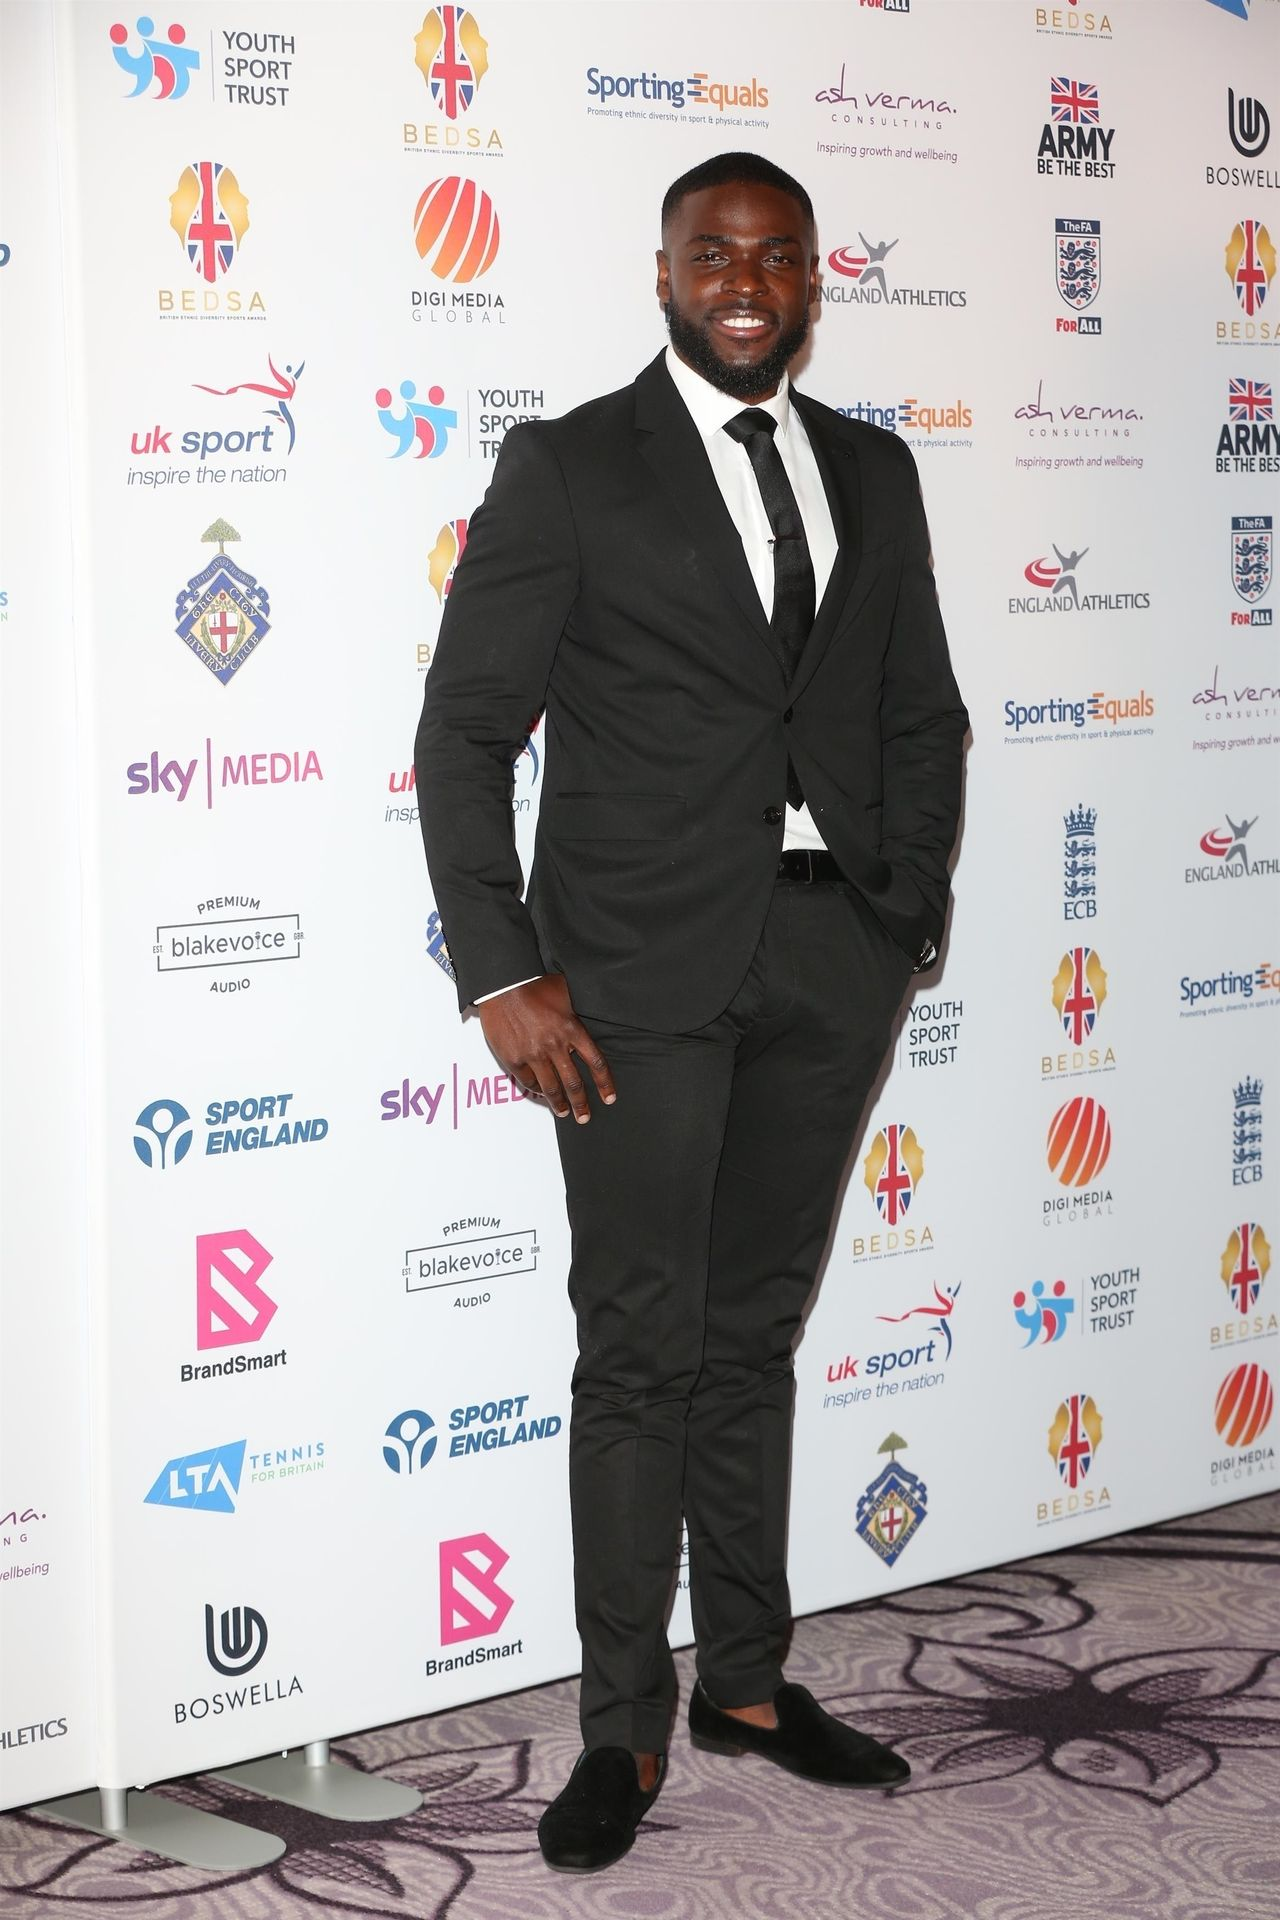 Mike Boateng & Priscilla Anyabu Are Seen At British Ethnic Diversity Sports Awards 0026